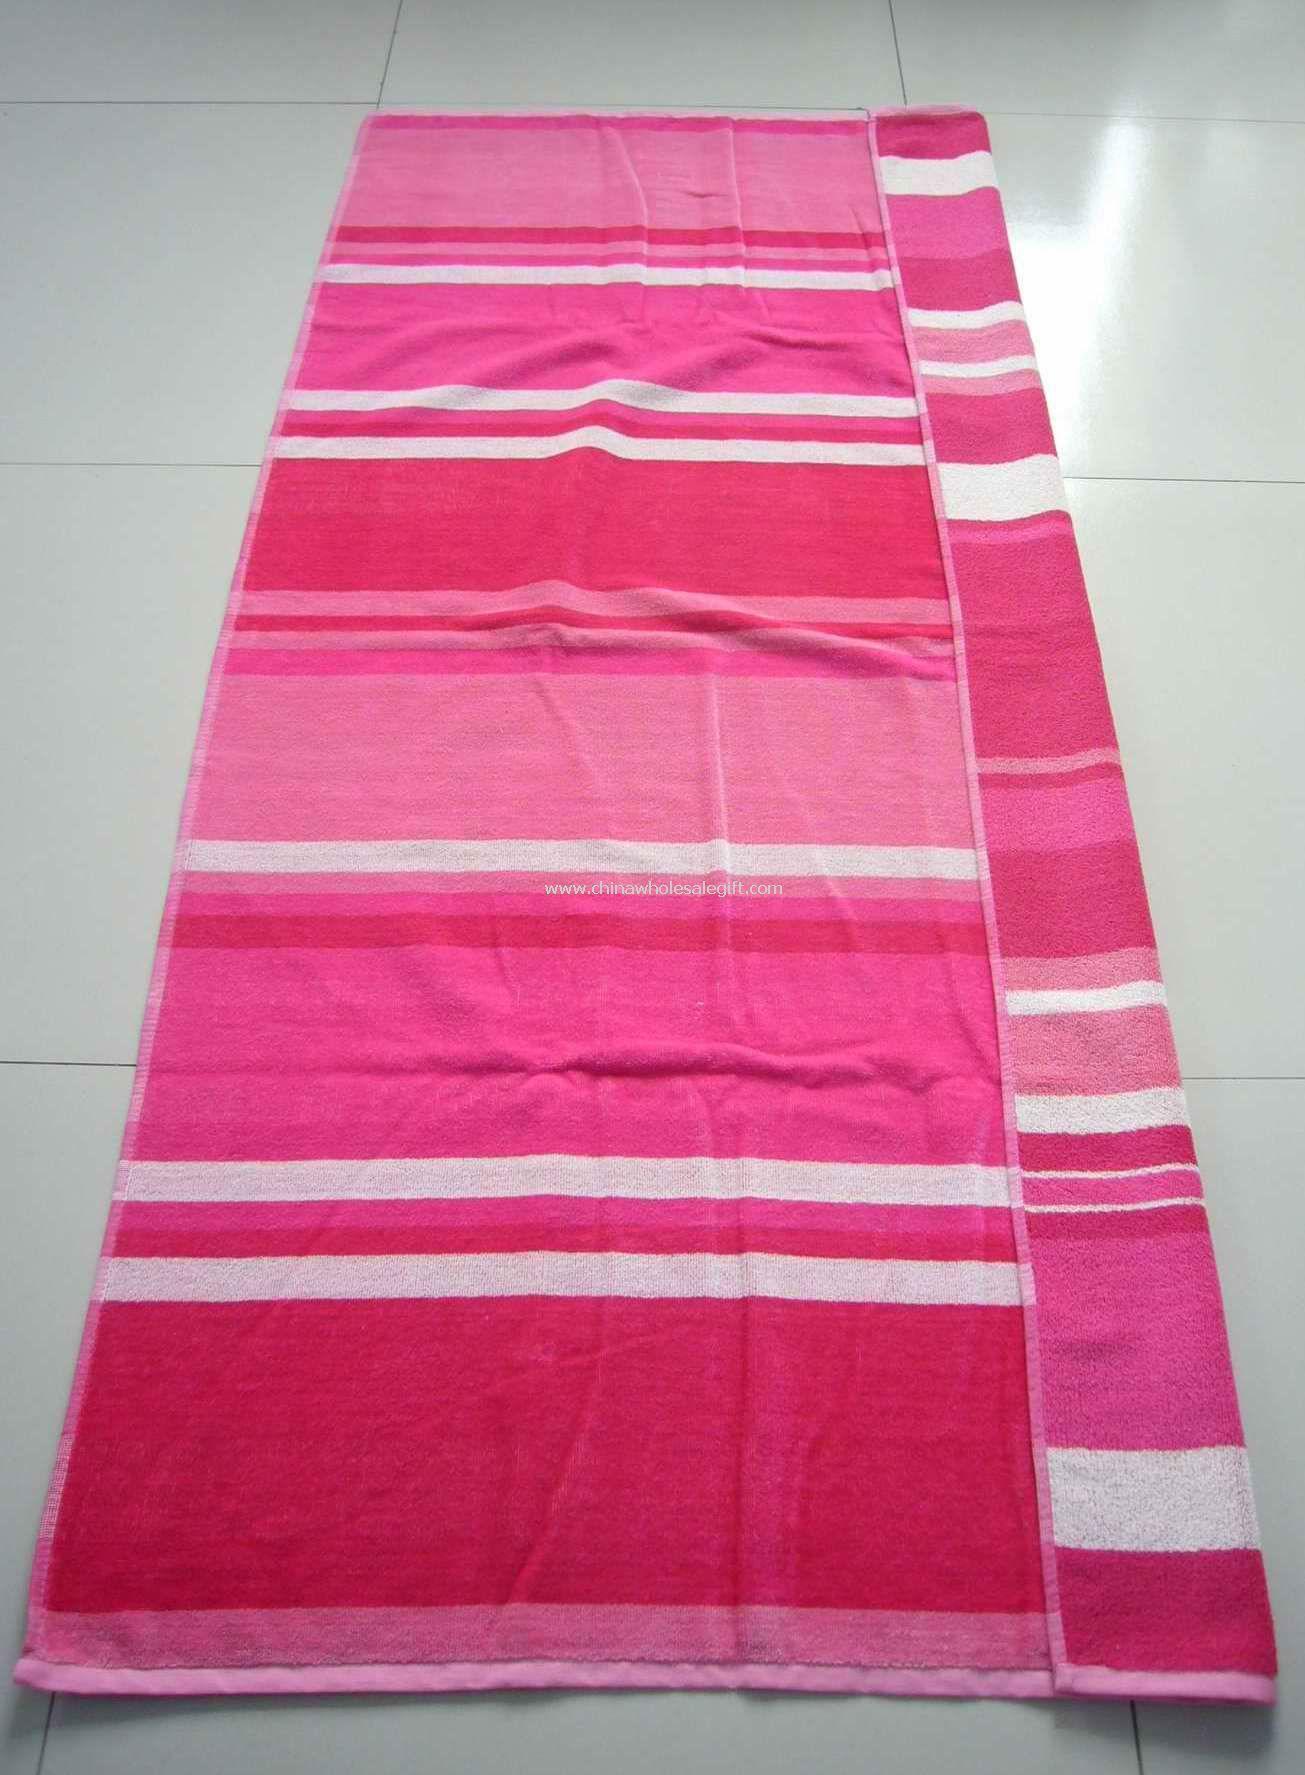 Velour Printed Beach Towel